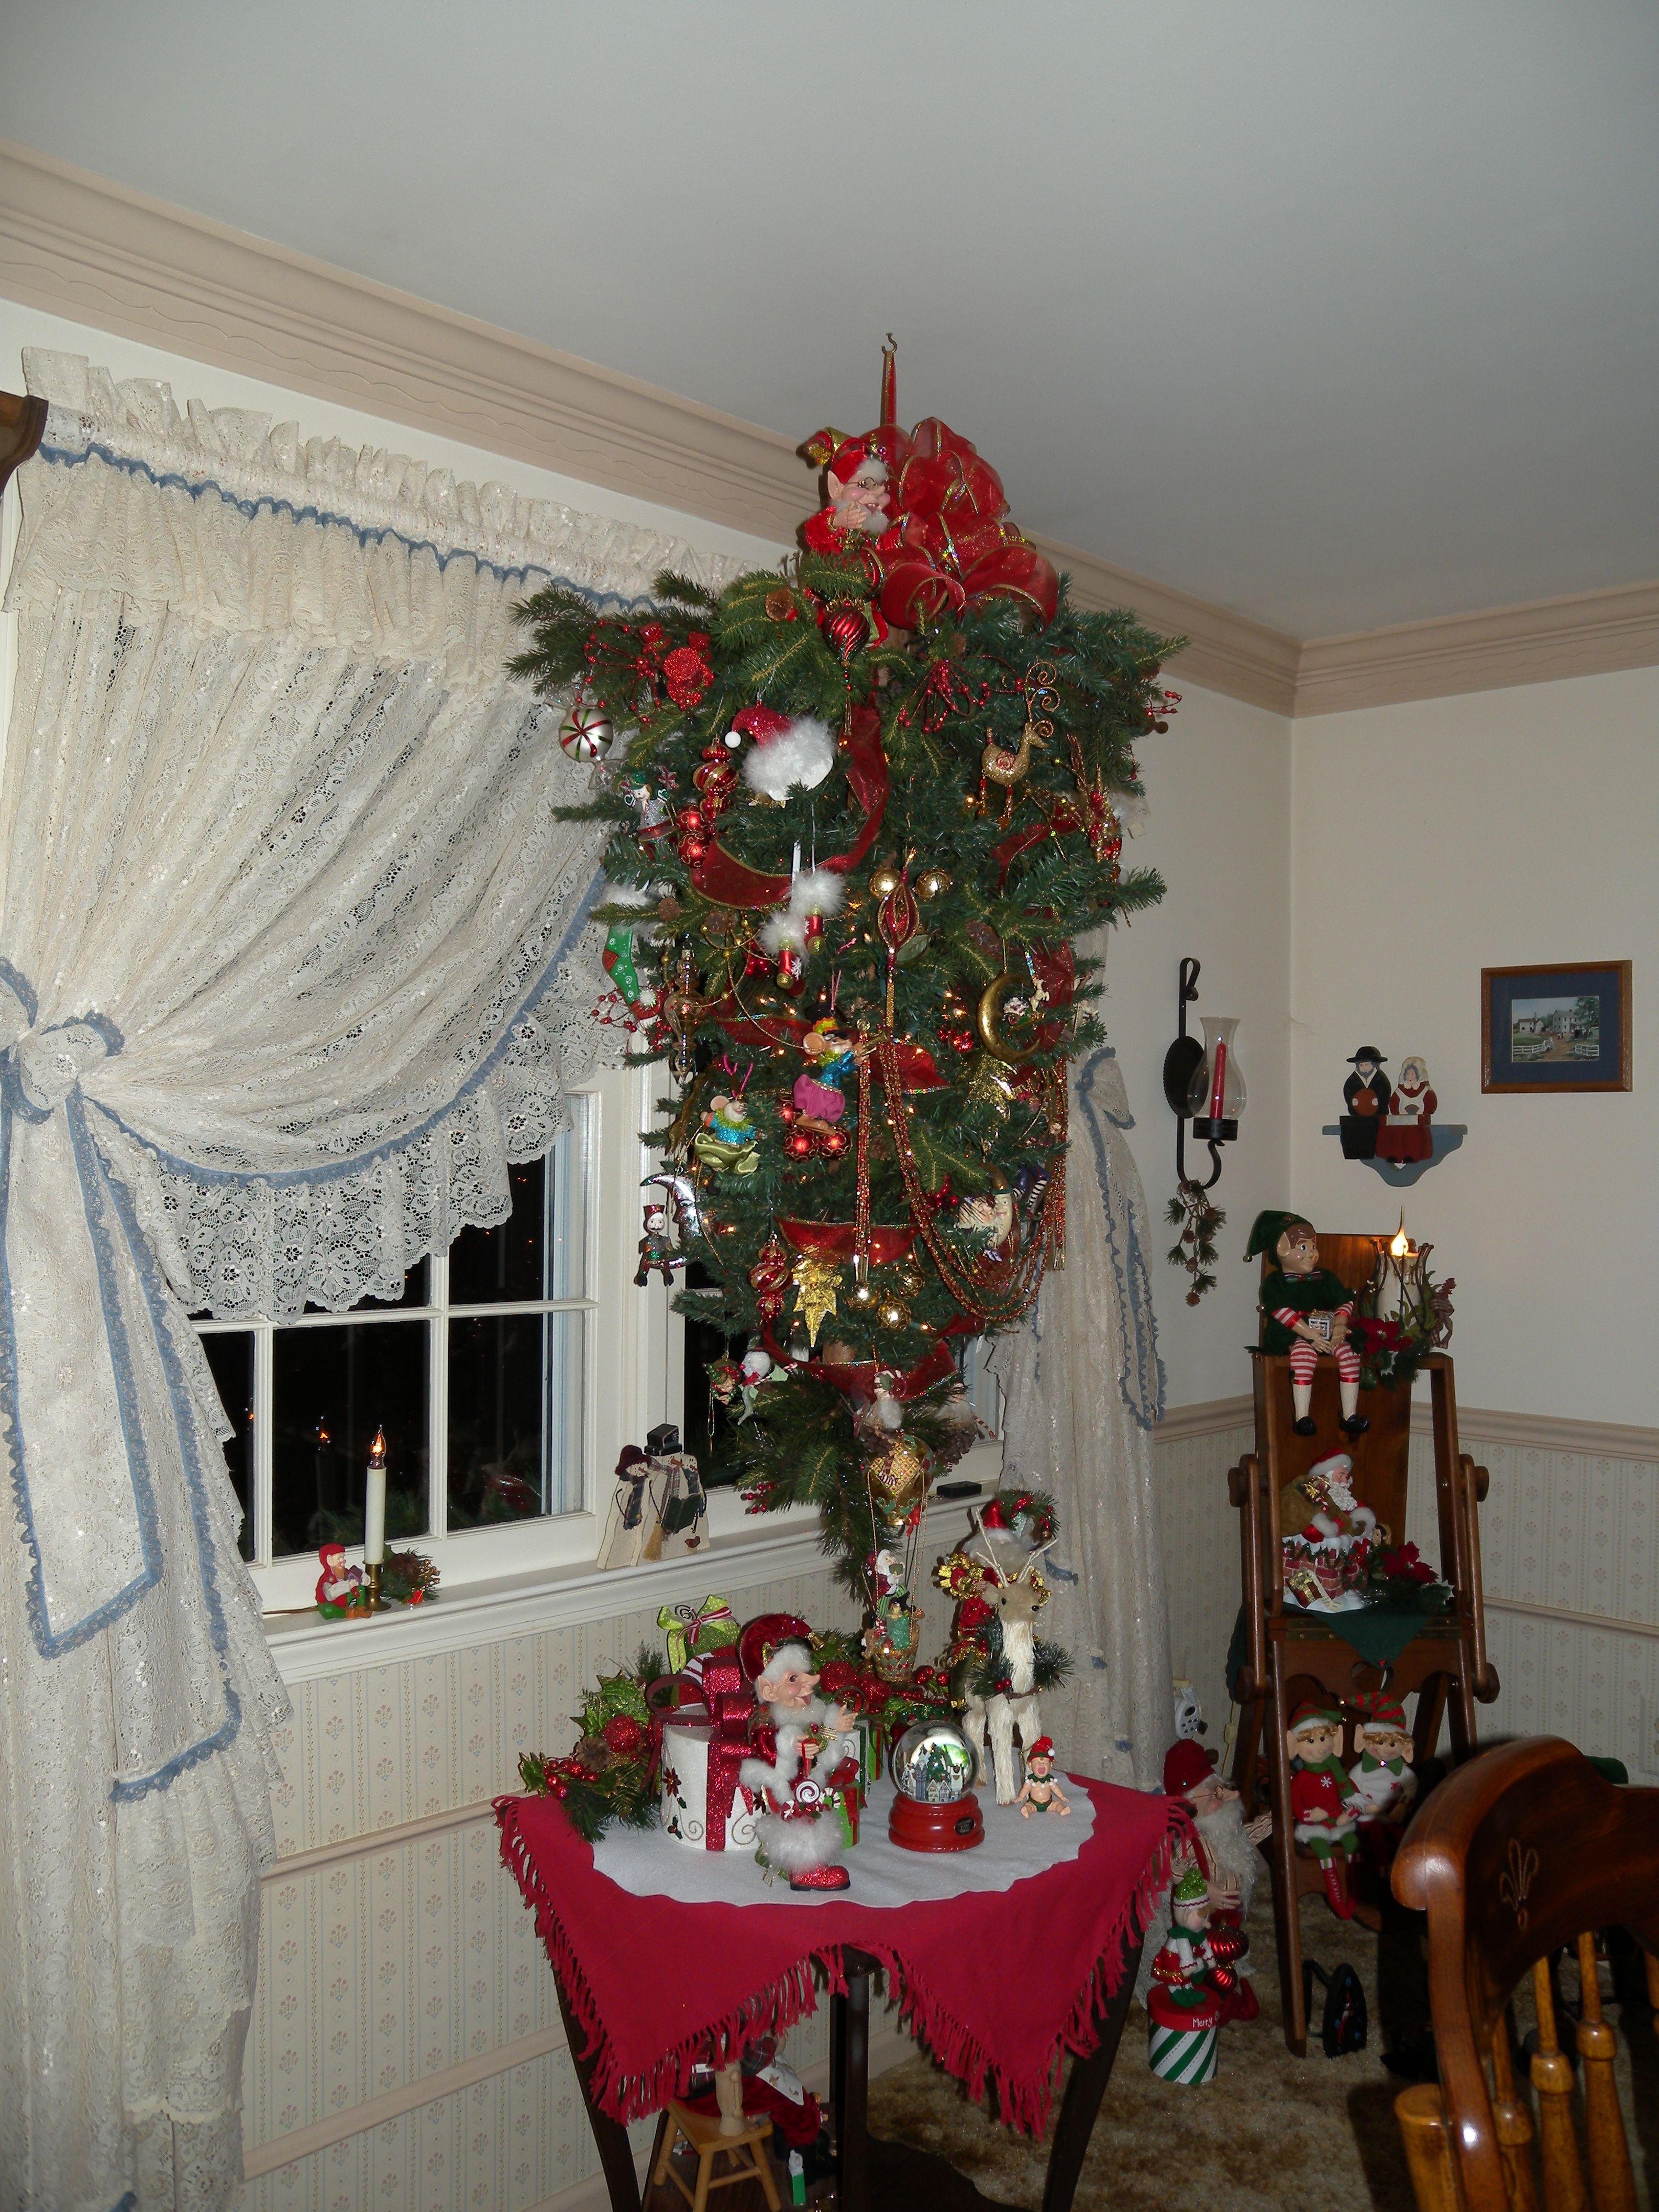 Meadows Farms Christmas Tree Photo Contest entry! Vote